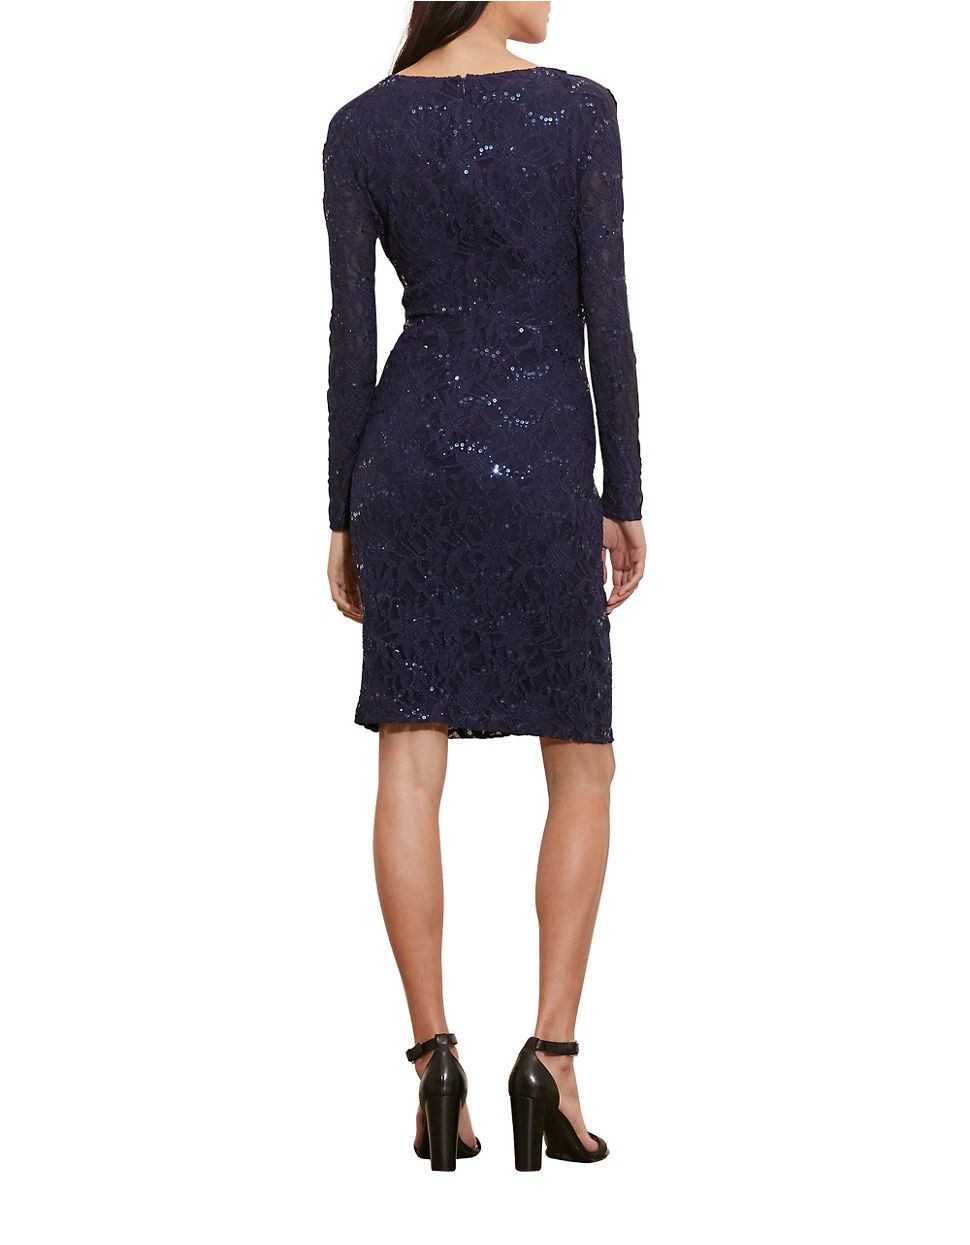 Navy Dresses  Shop for Navy Dresses on Polyvore